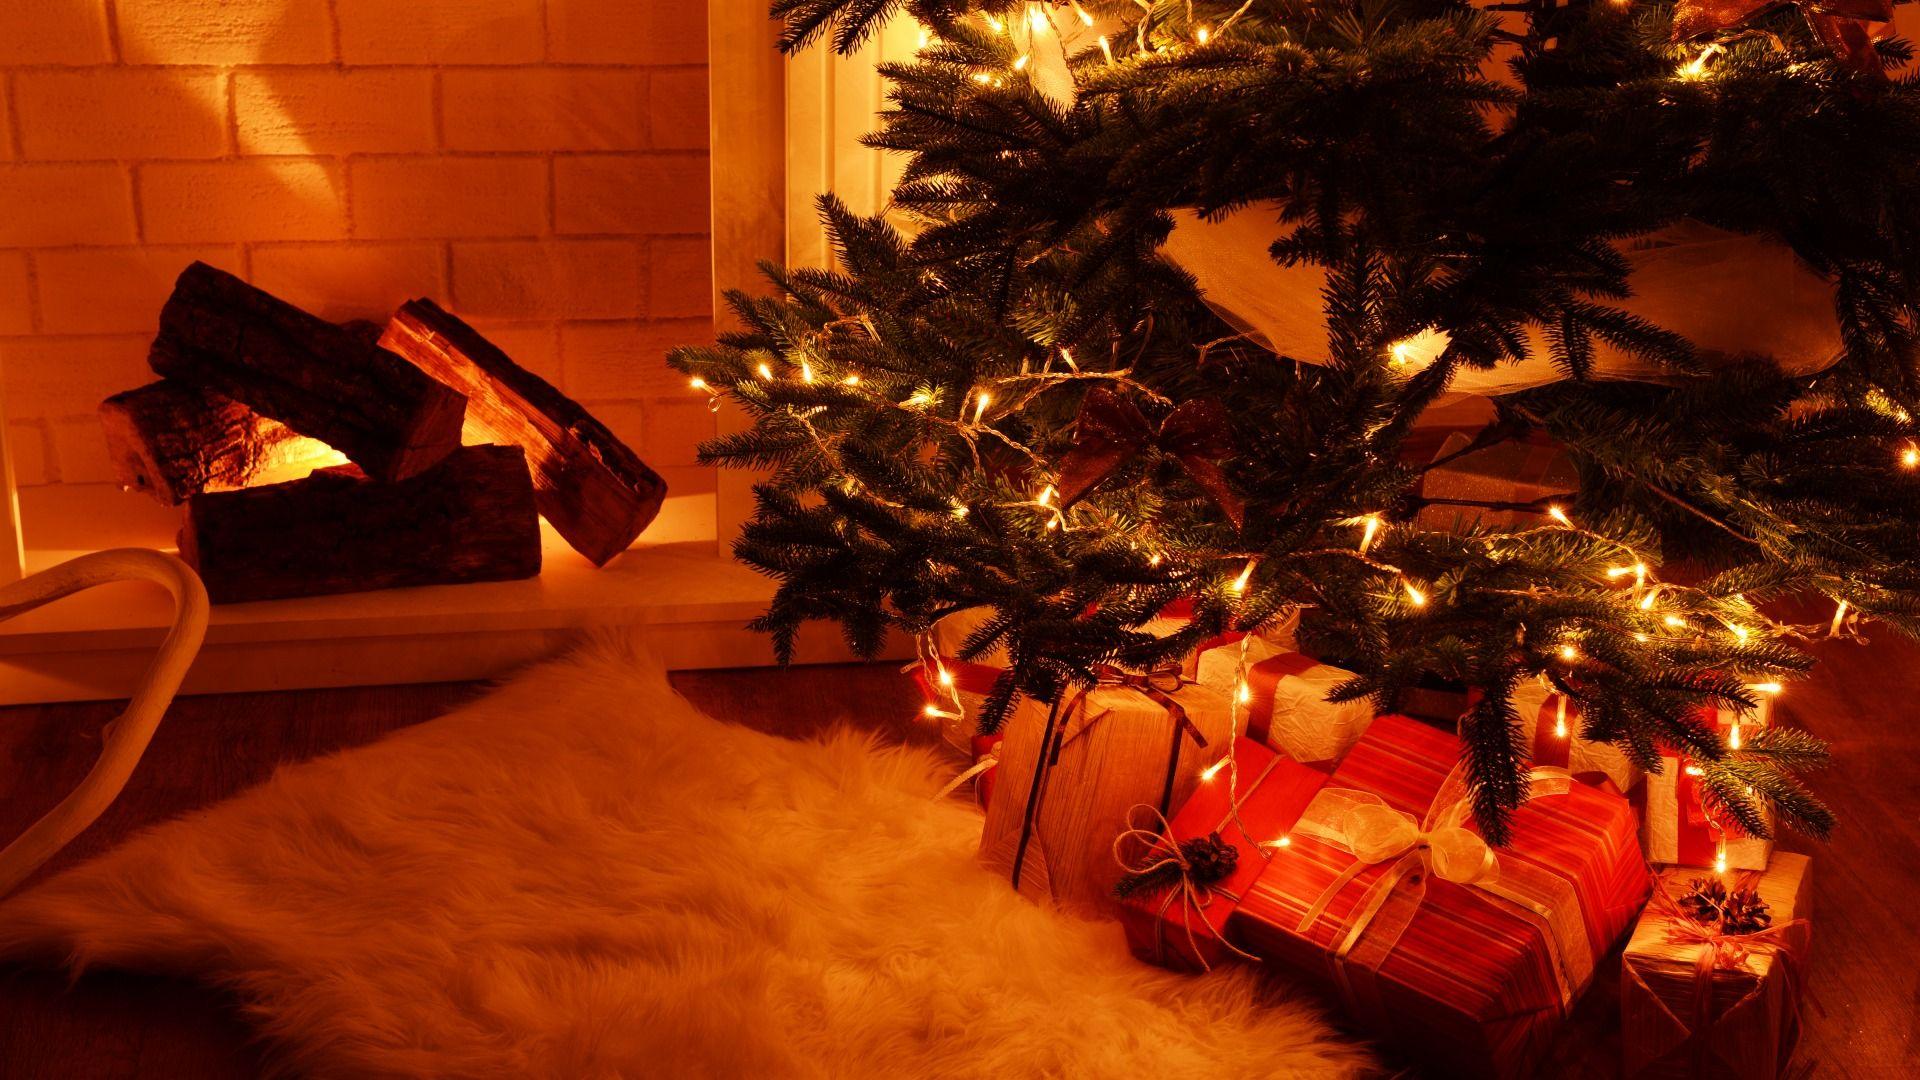 Christmas Fireplace Comfort wallpaper photo